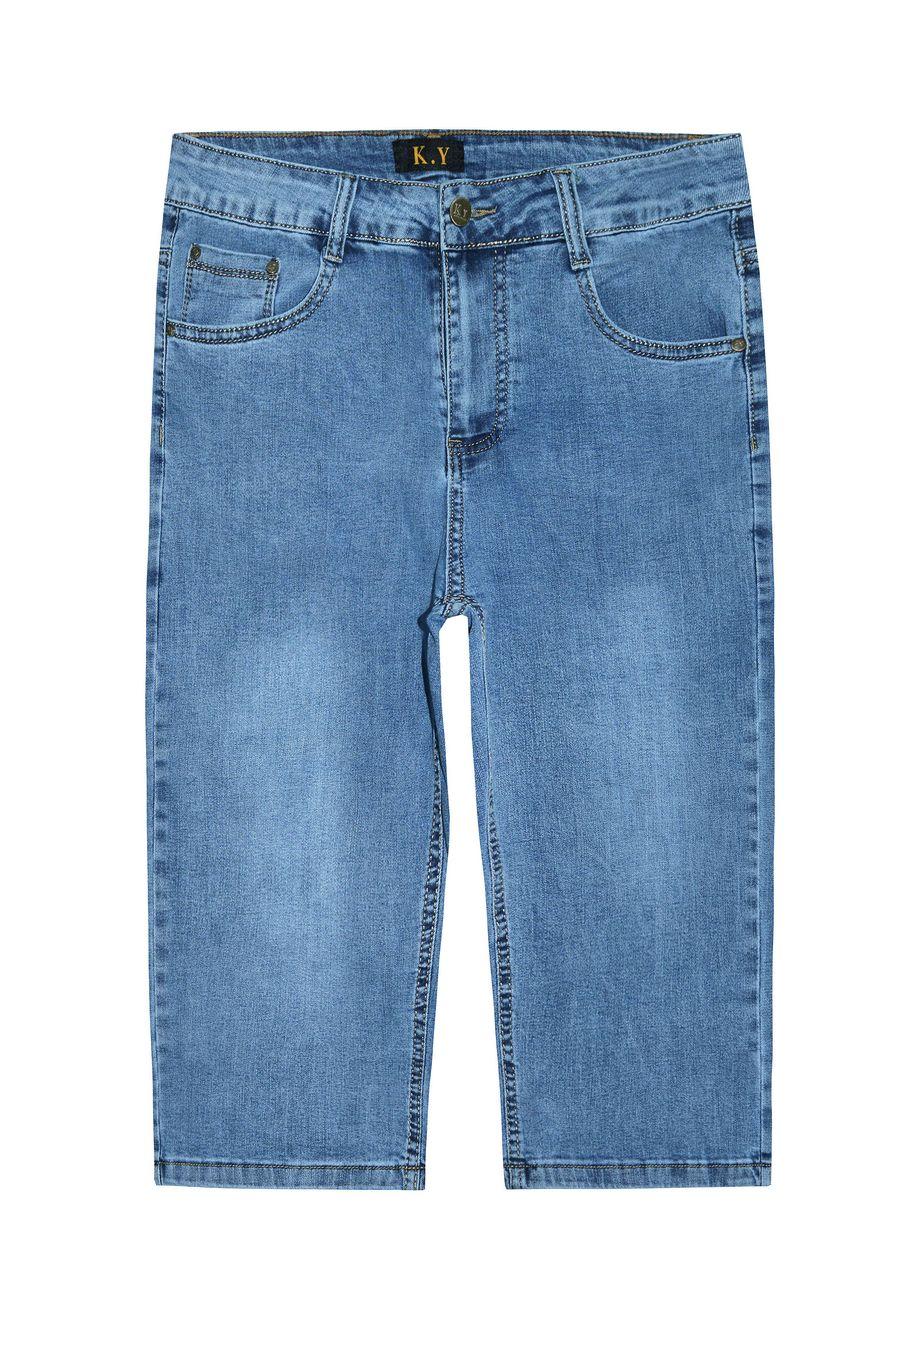 Бриджи женские K.Y Jeans LС429 - фото 1